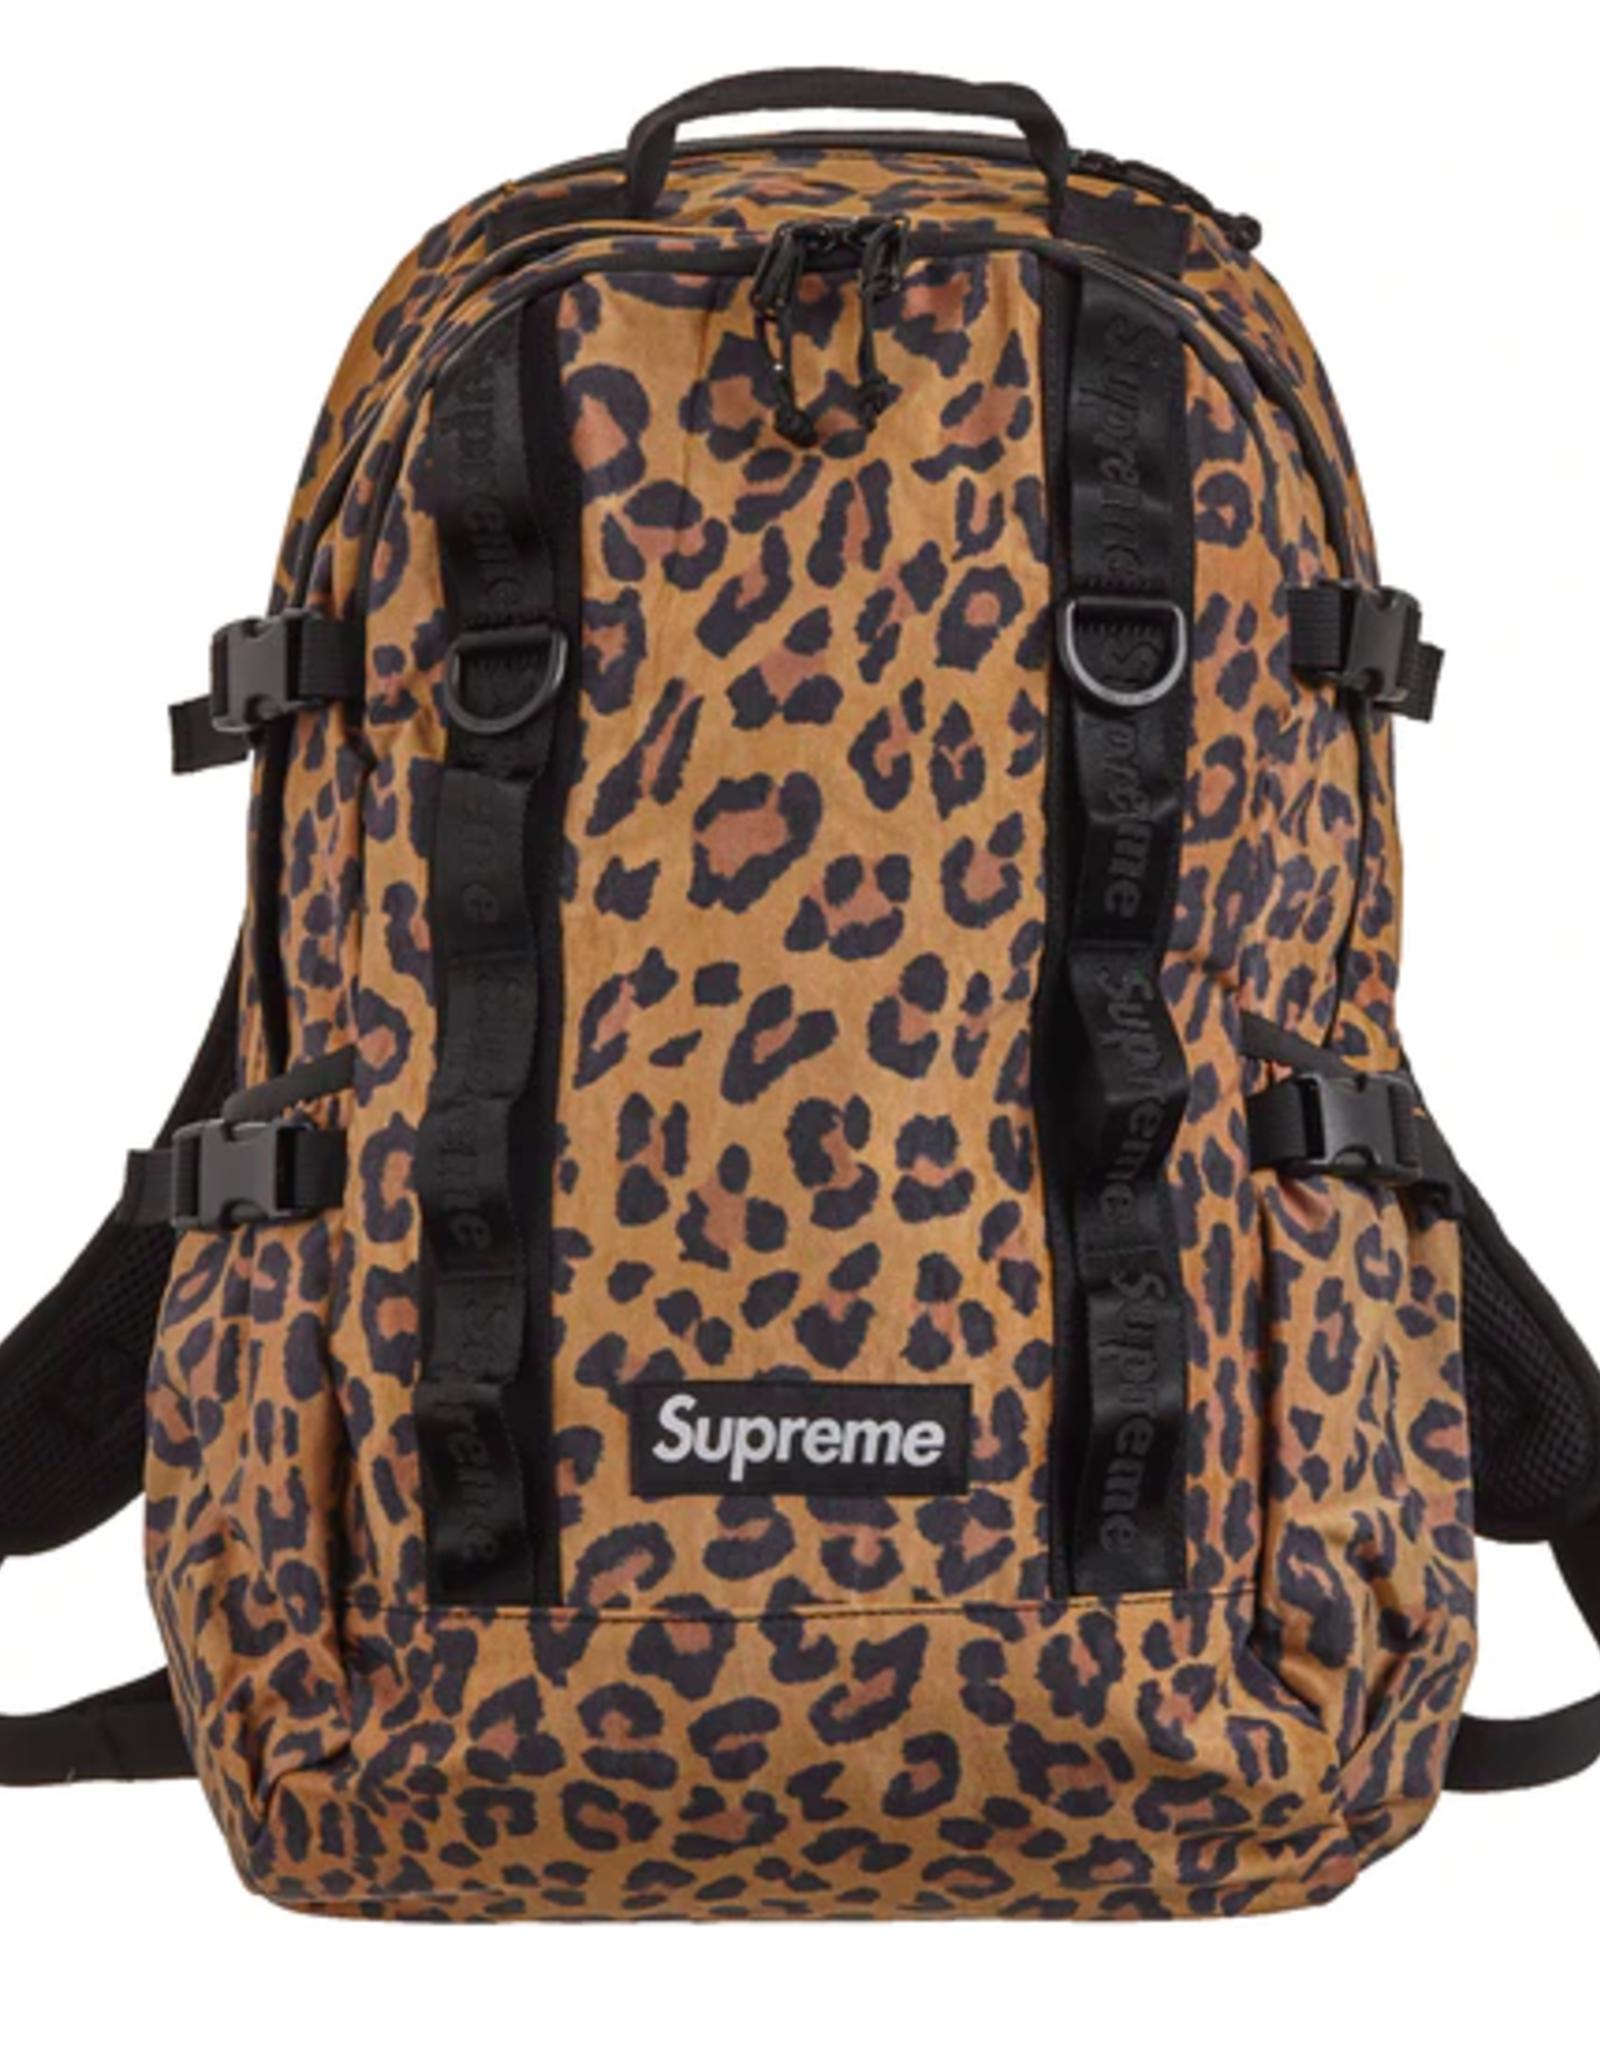 SUPREME Backpack (FW20) Leopard